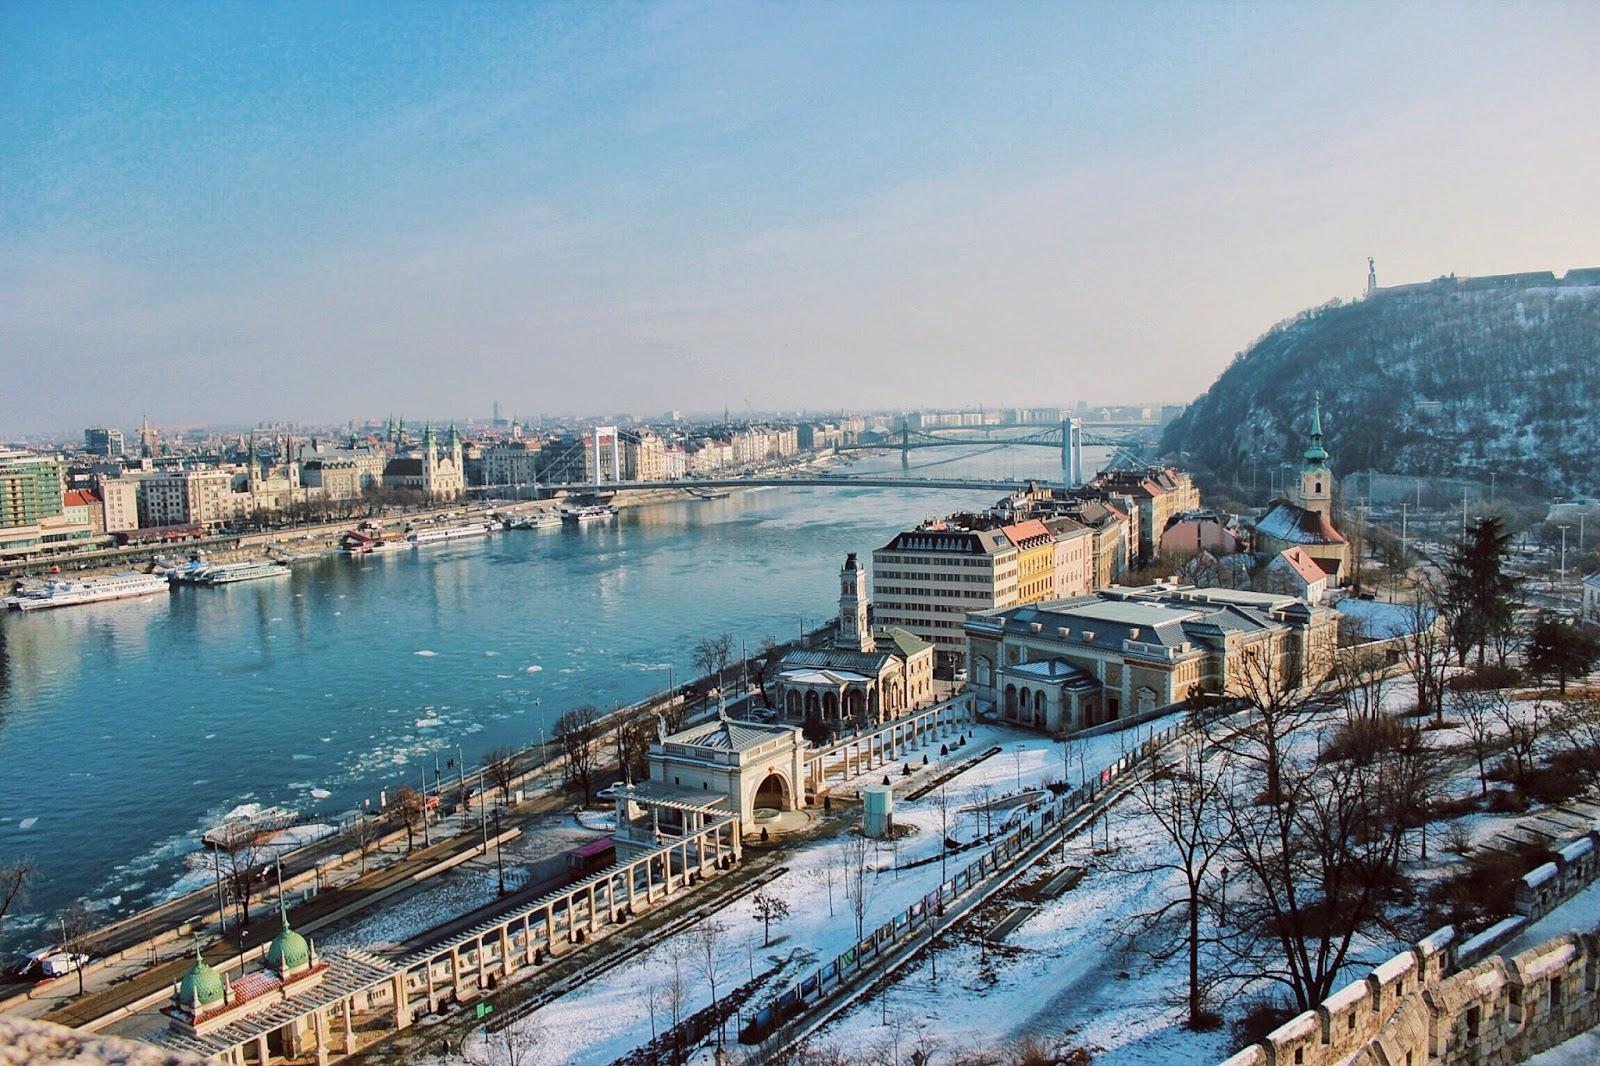 lifesthayle-budapest-buda-castle-city-view.jpg